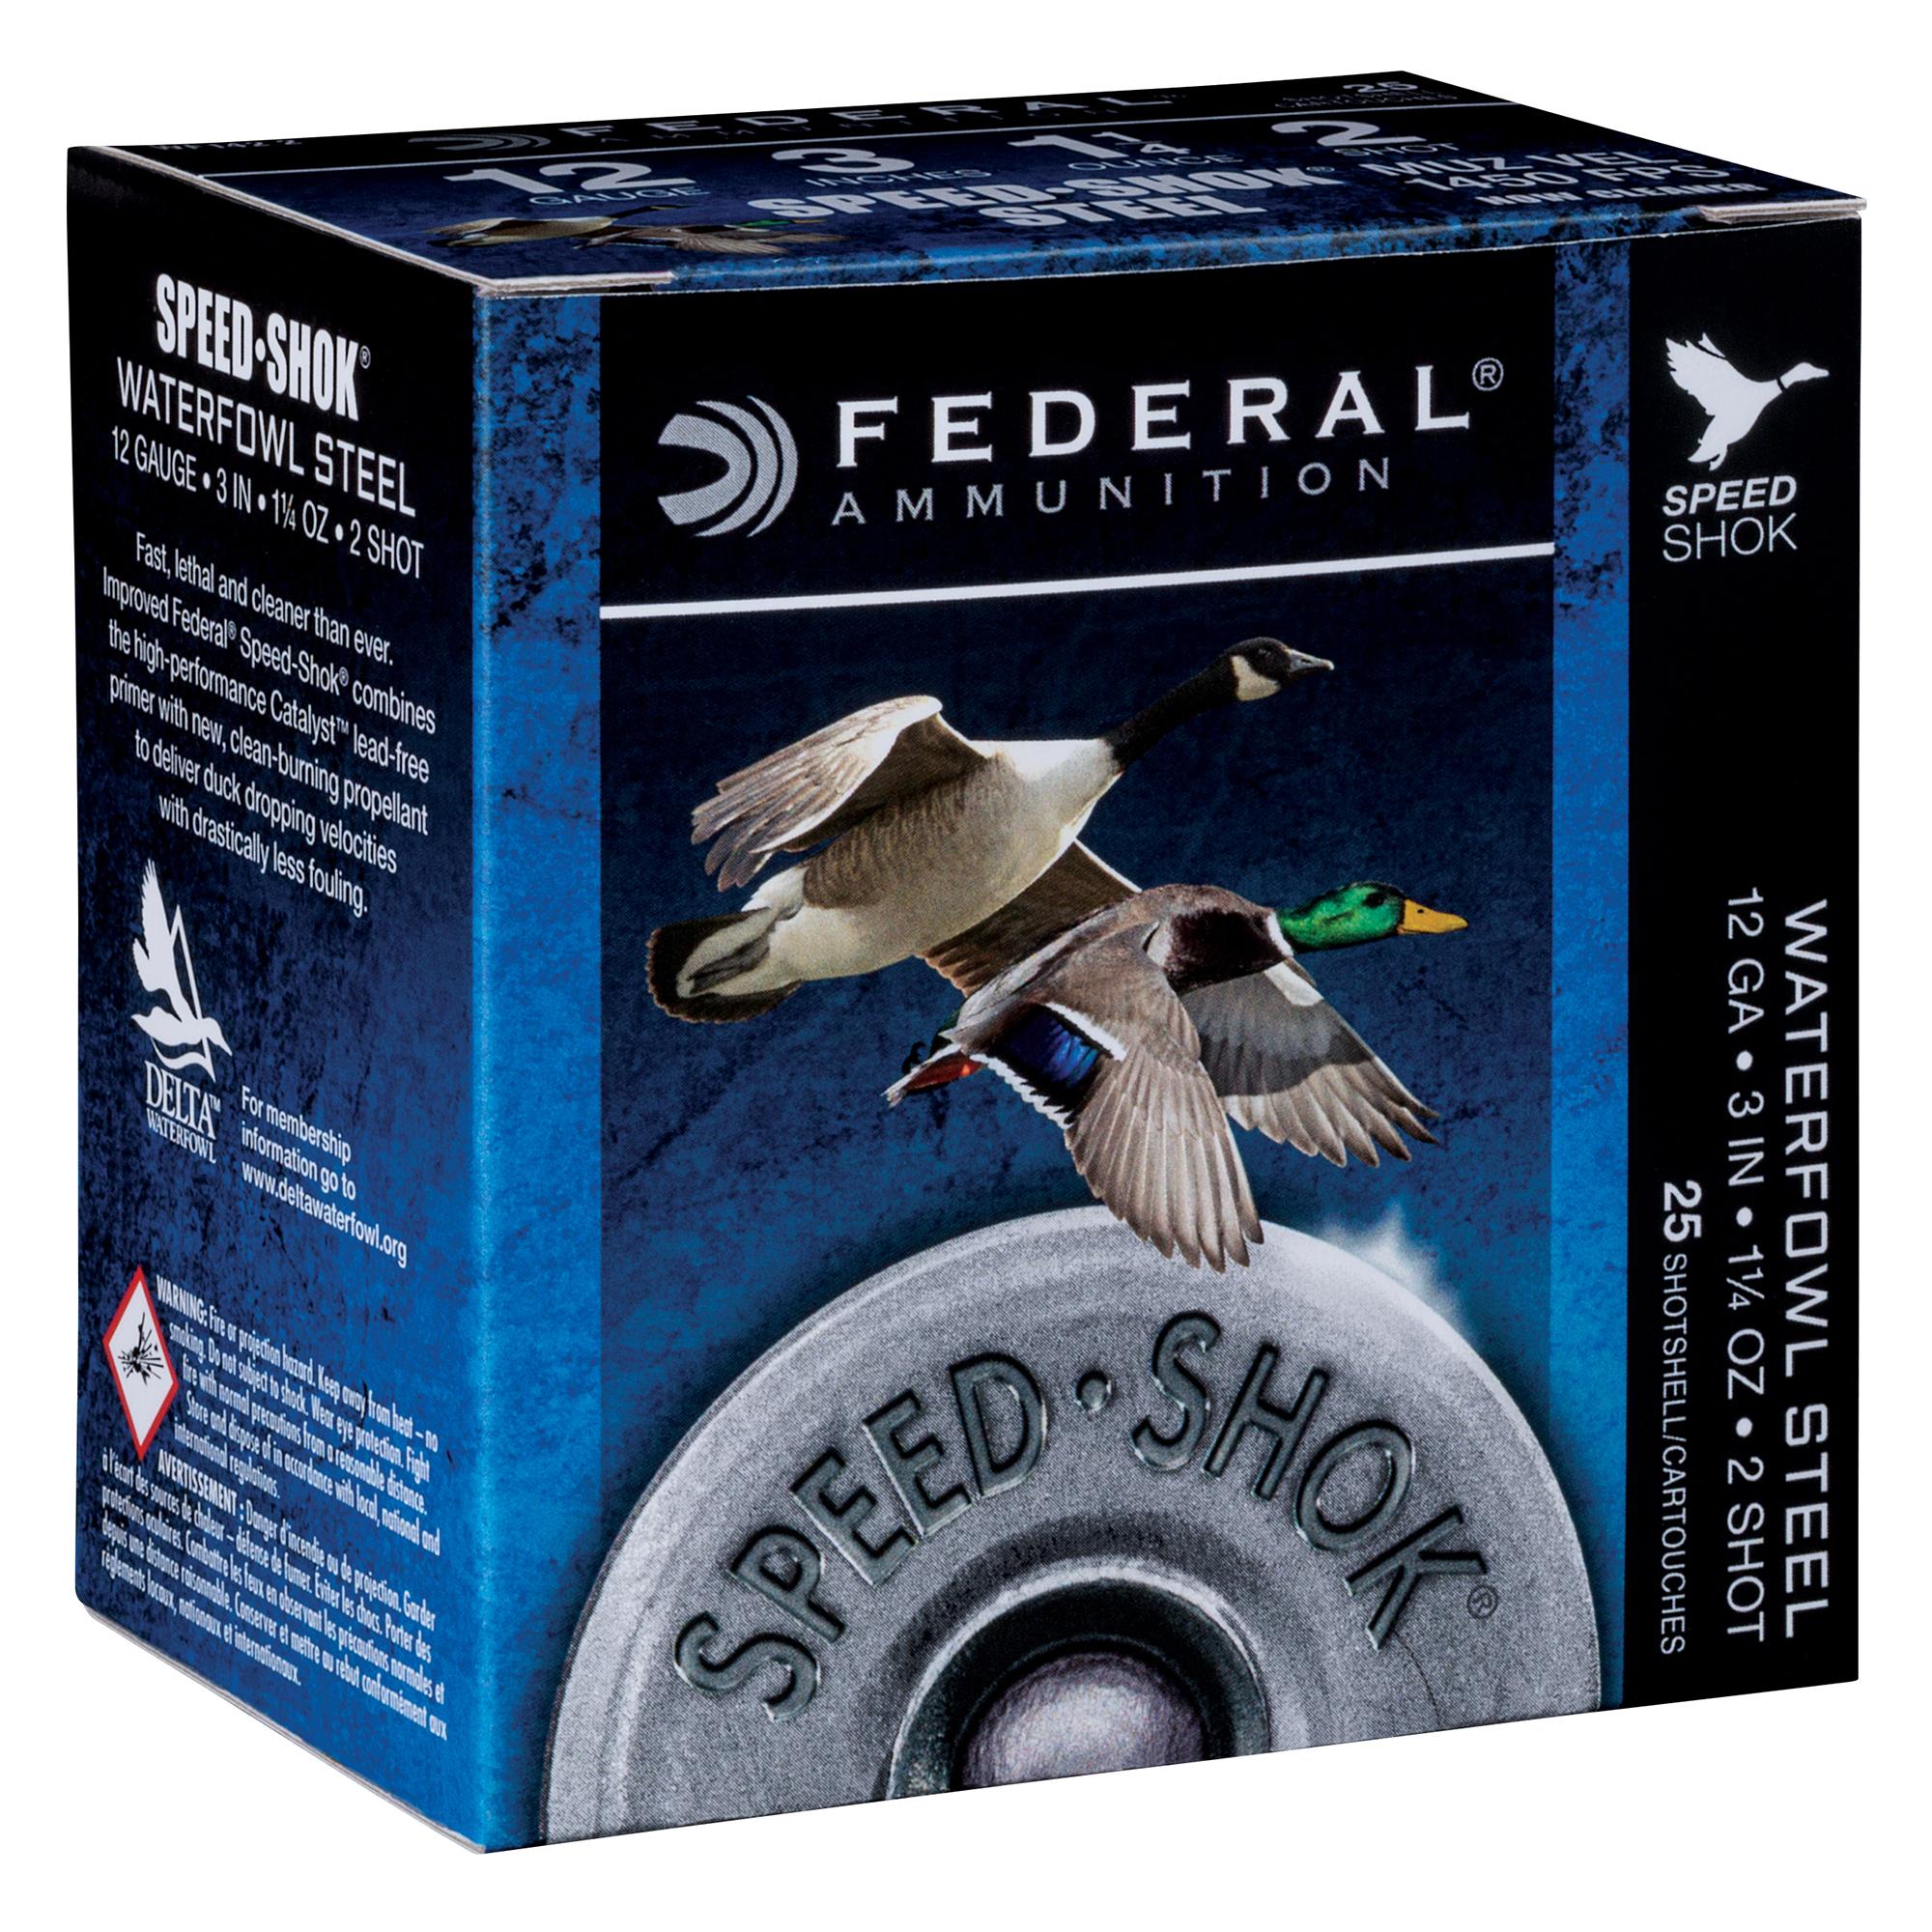 Federal Premium Speed-Shok Steel Waterfowl Loads, 12-ga, 3″, 1-1/4 oz, 2